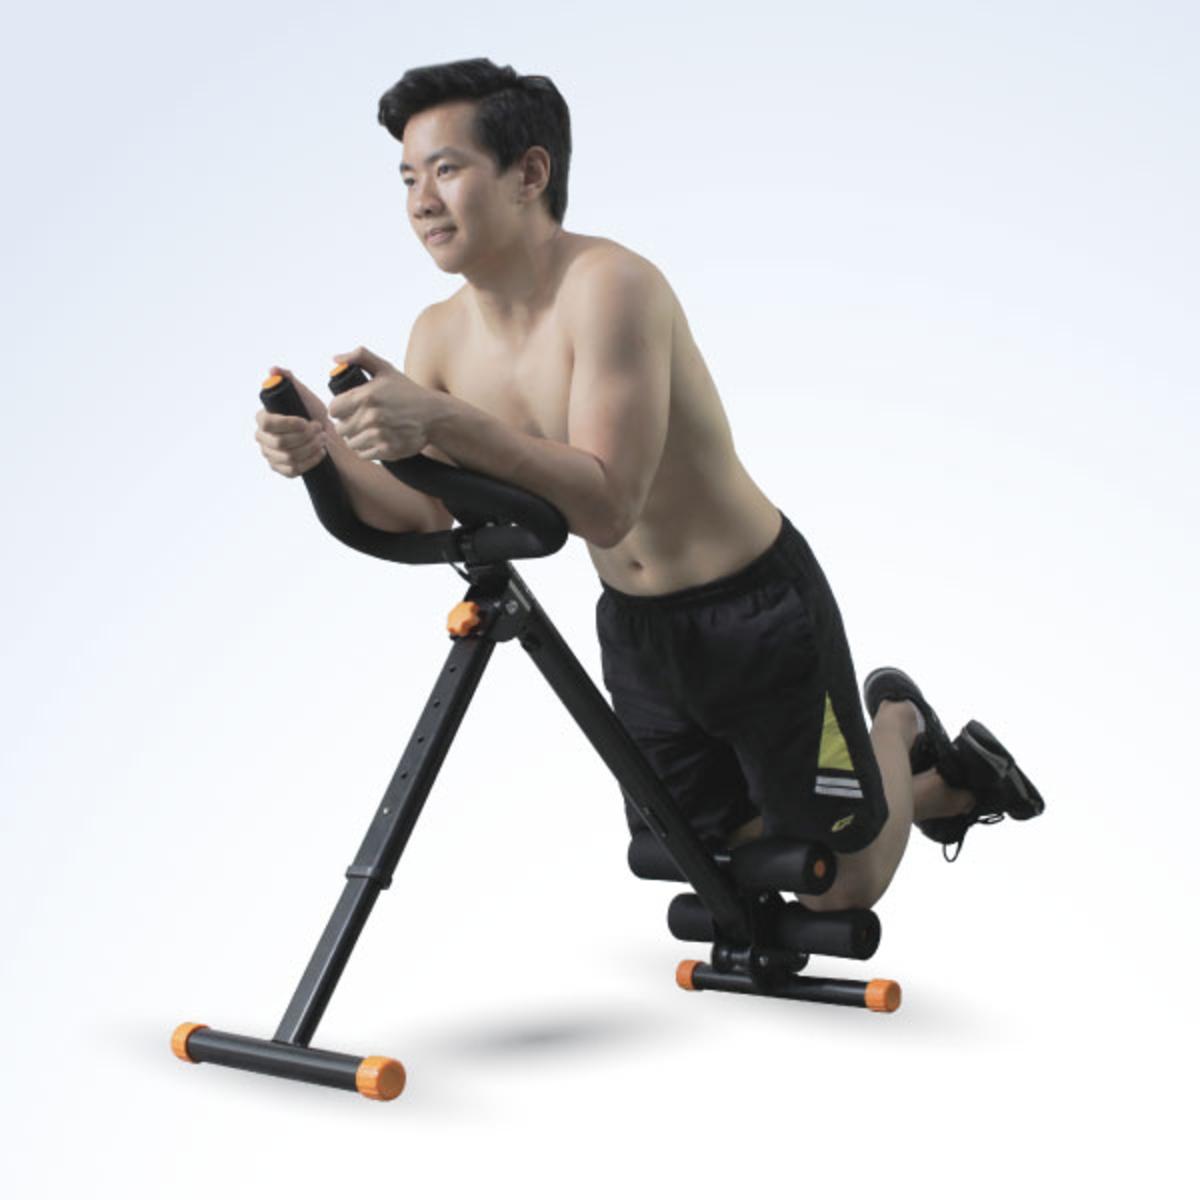 ab fitness 5 minutes shaper with lose belly fat slimming belt black lazada ph. Black Bedroom Furniture Sets. Home Design Ideas